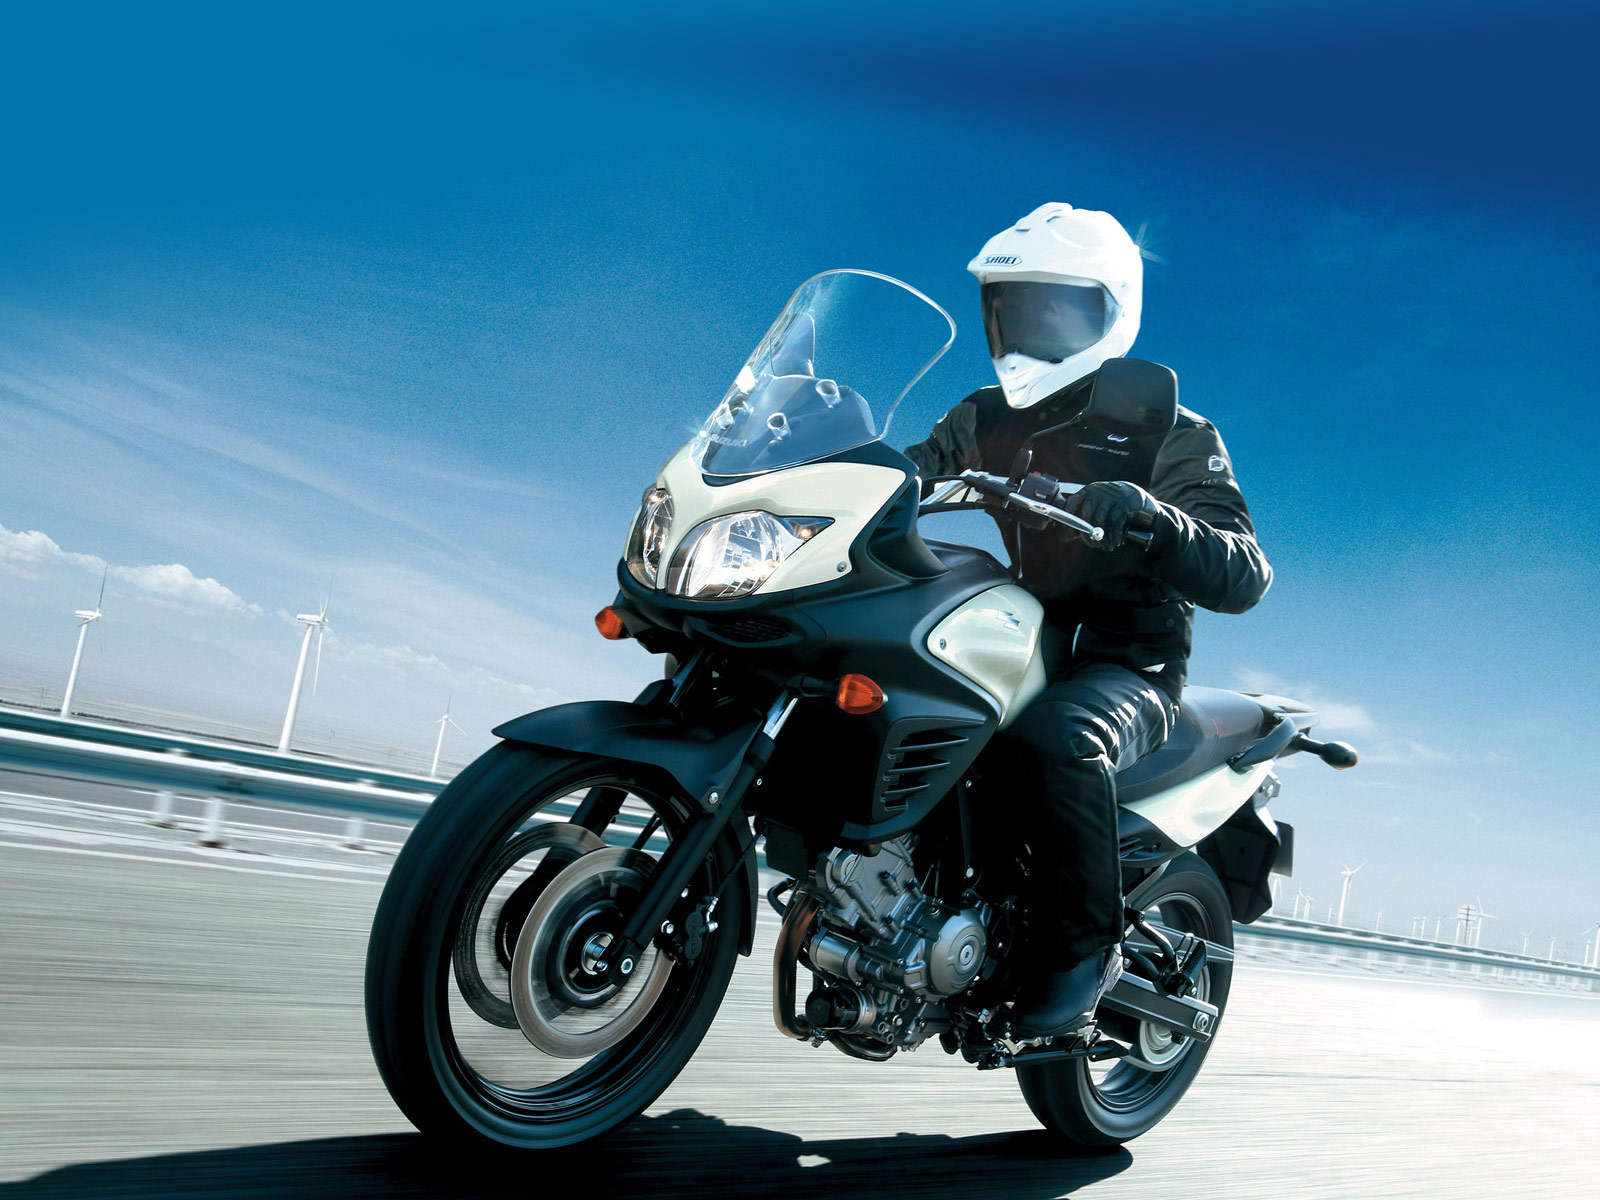 http://2.bp.blogspot.com/-_c1lsD56XlY/Tpz7dO89TmI/AAAAAAAACdU/uz4GDEBHn98/s1600/2012-Suzuki-VStrom-650-ABS_motorcycle-desktop-wallpaper_8.jpg